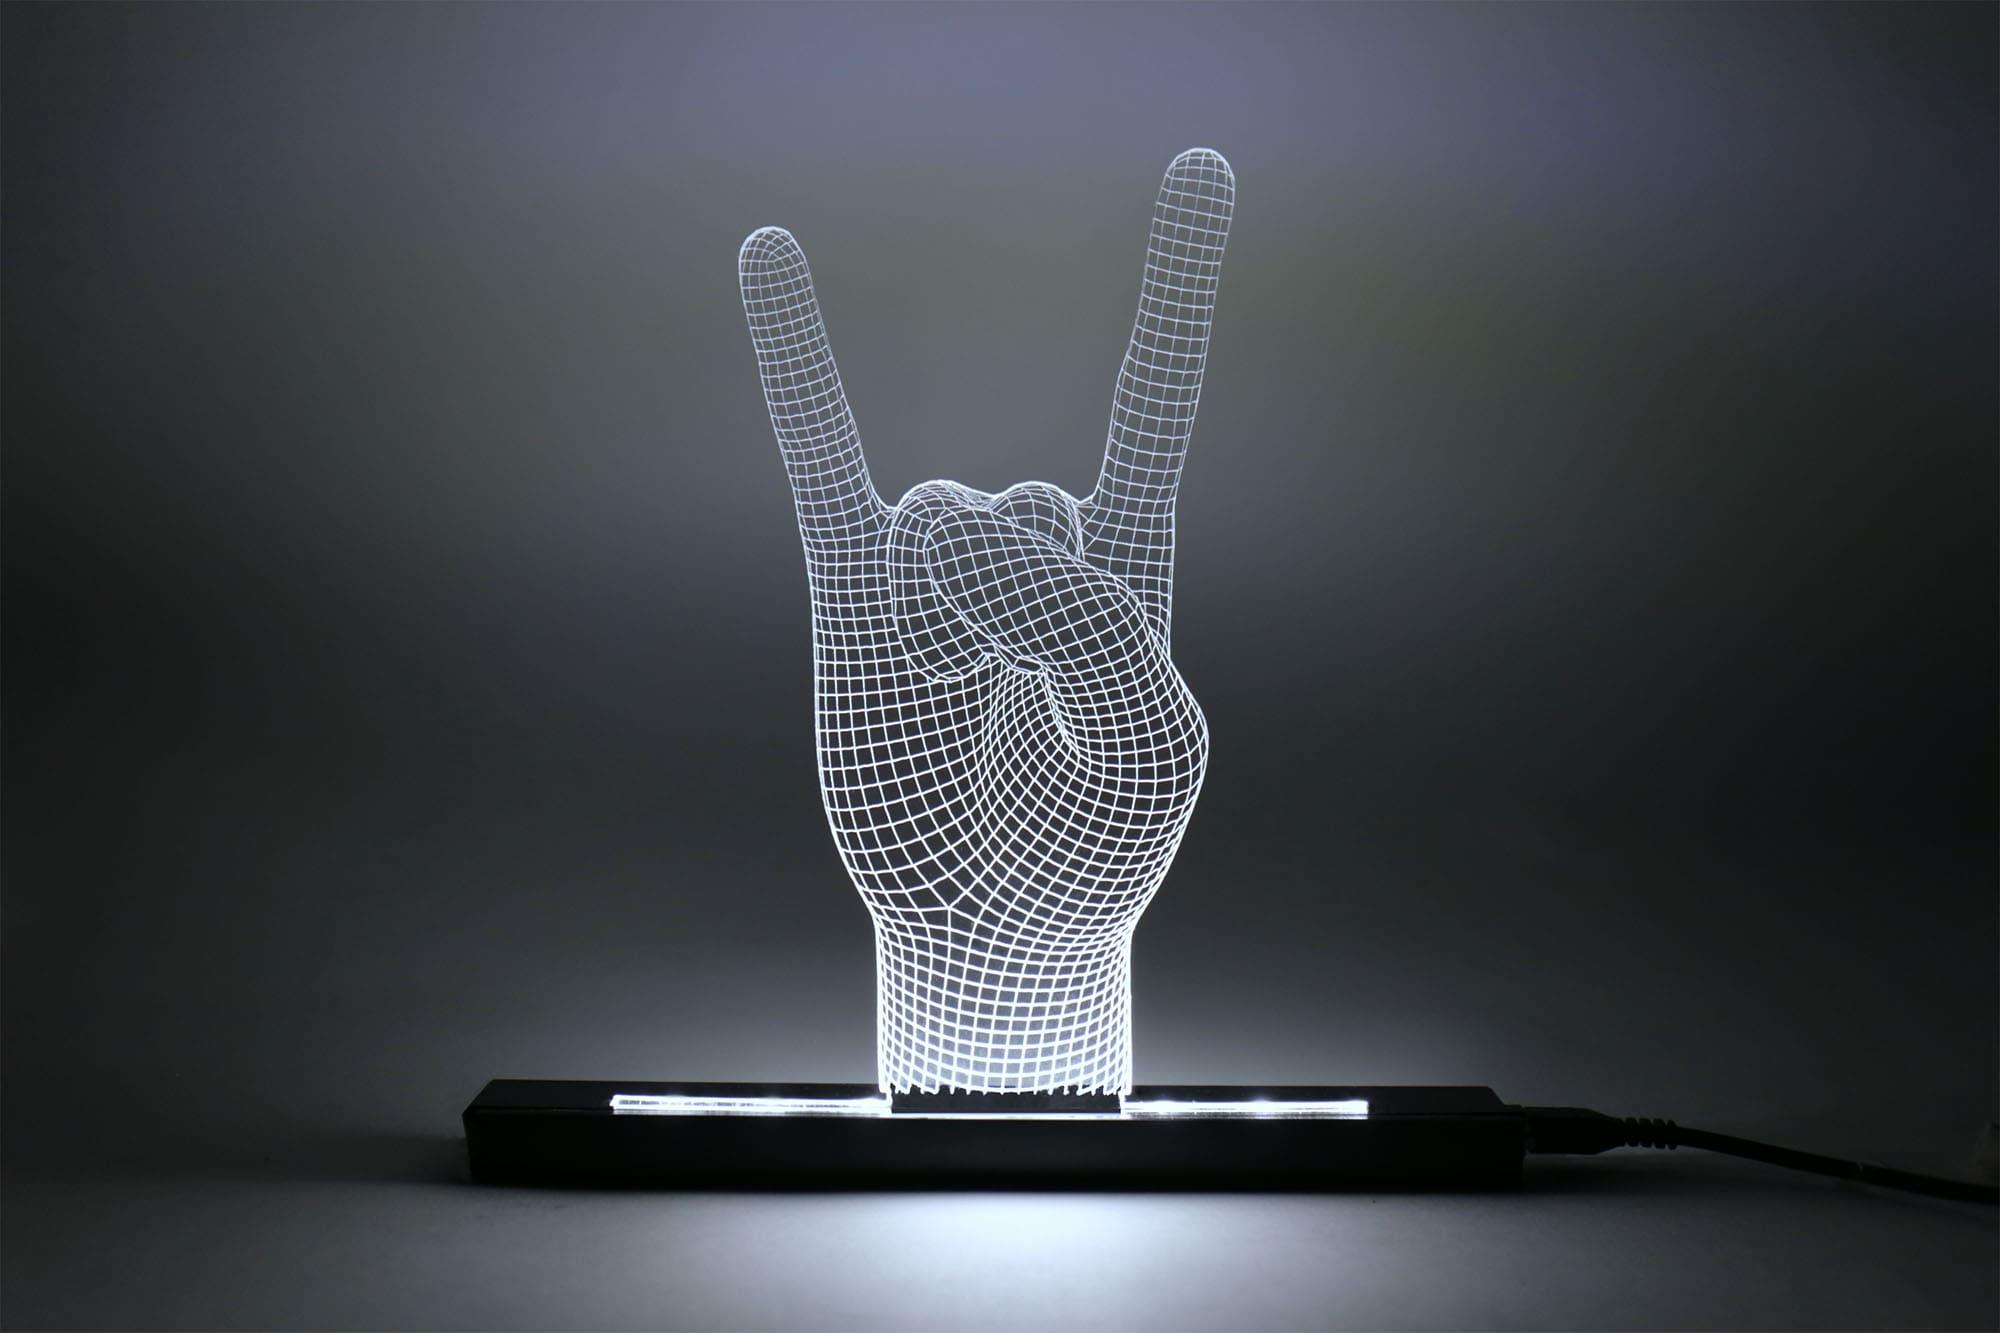 LED-Normal-Light-5000k-Acrylic